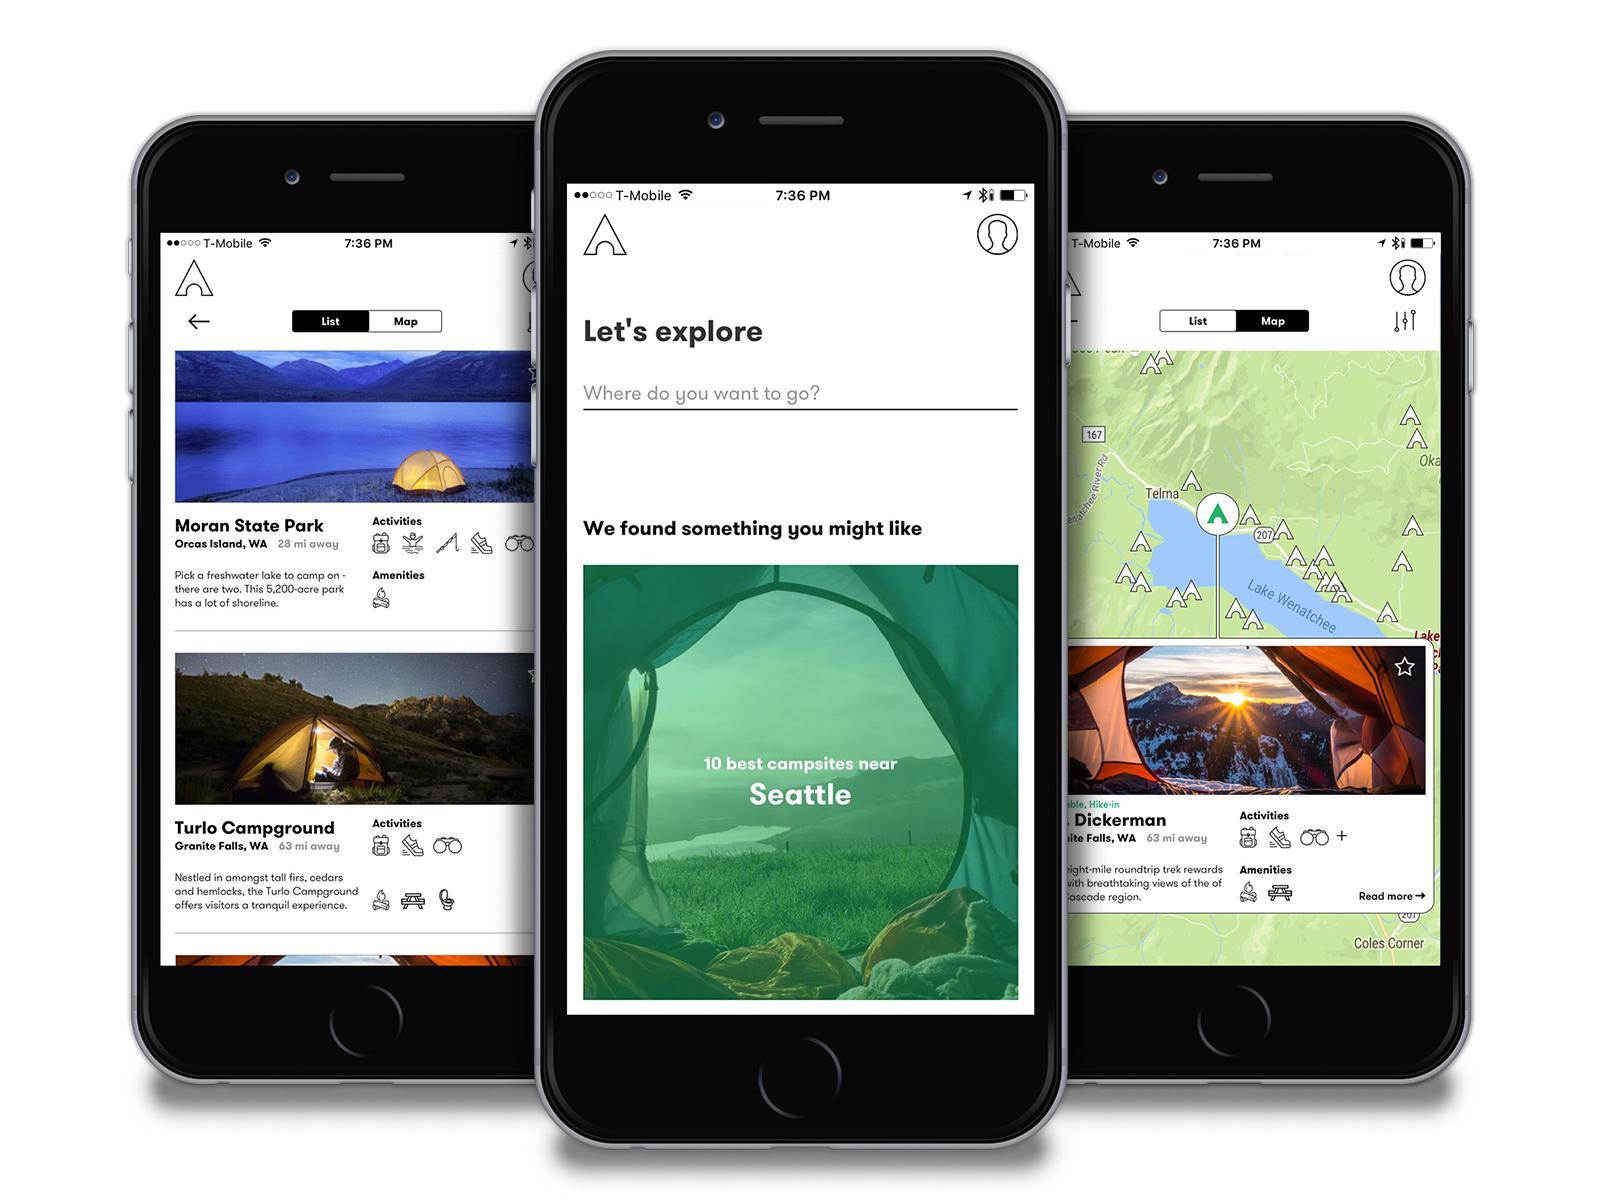 Rec.gov mobile app - Rec.gov - concept